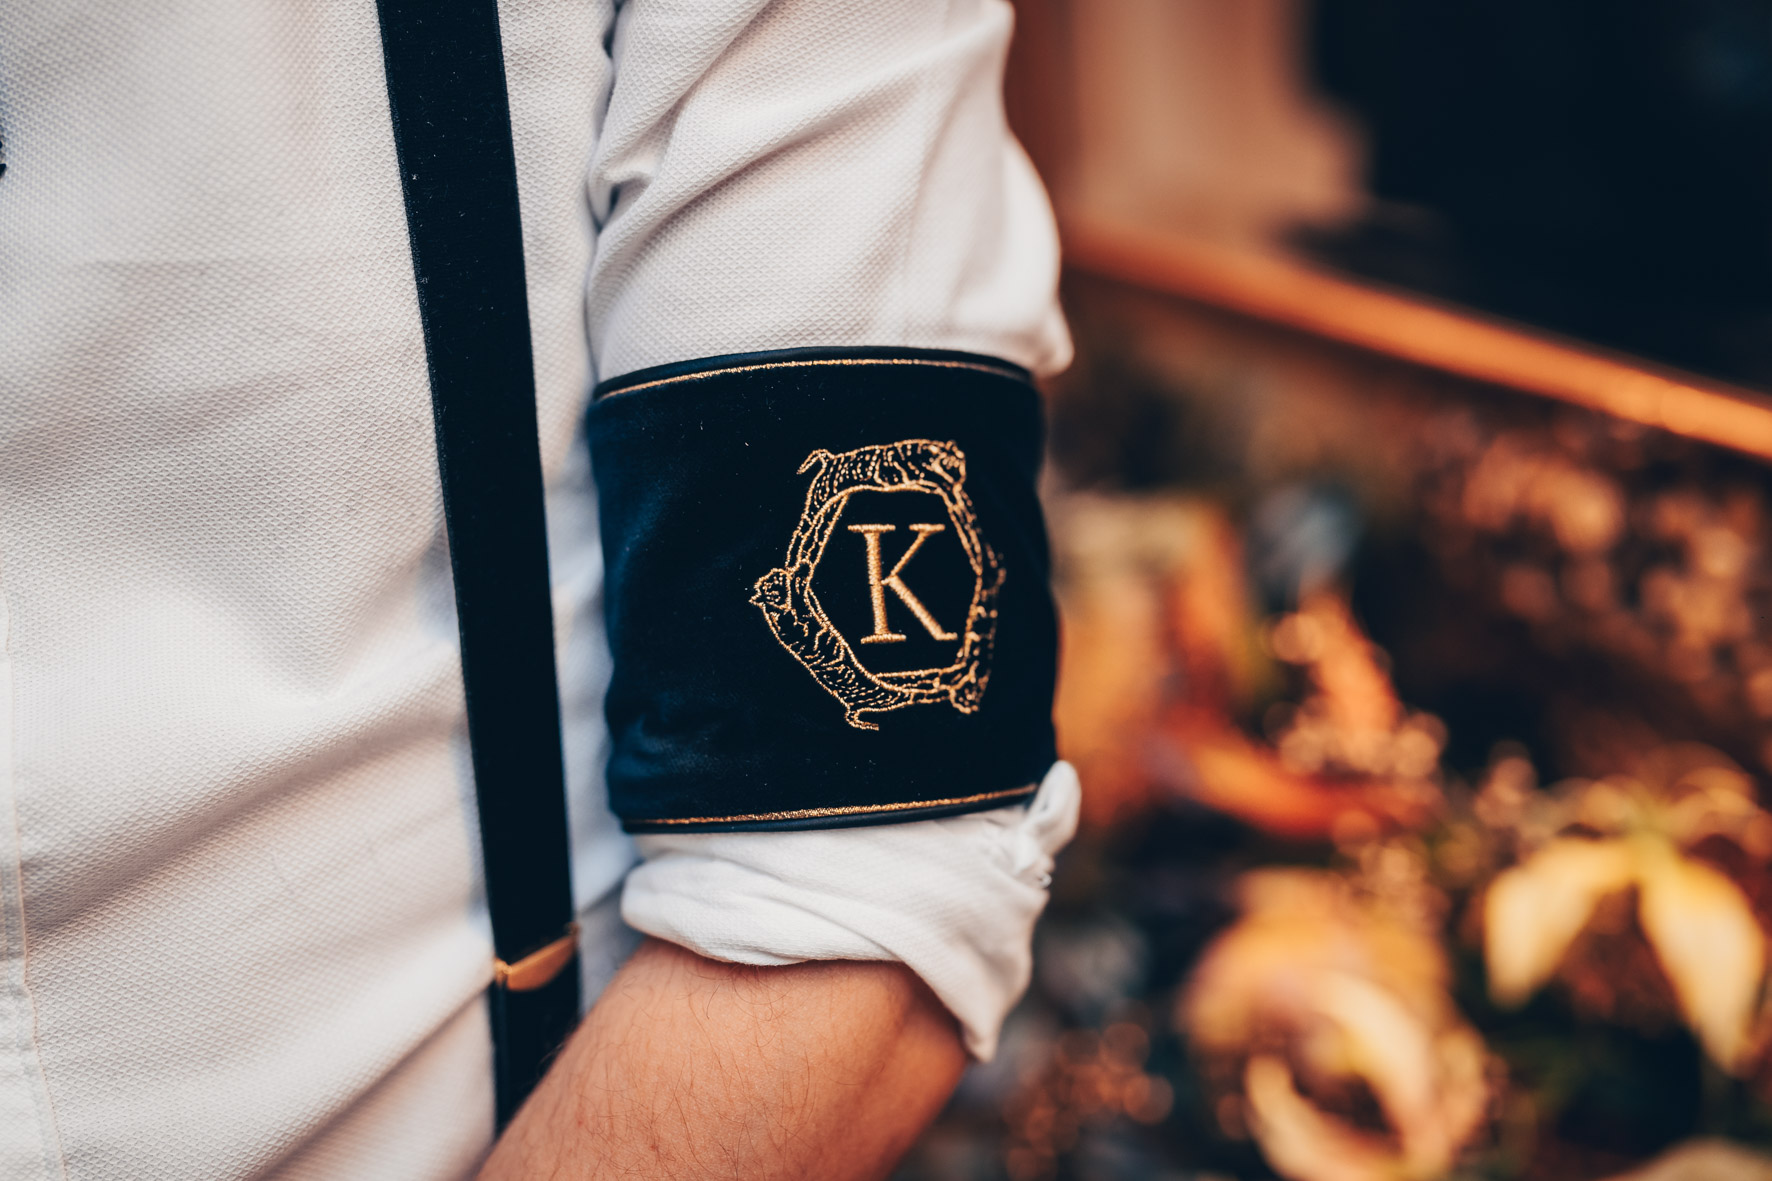 Konrad-lifestyle-art-basel-%22grand-party%22-2019-62.jpg